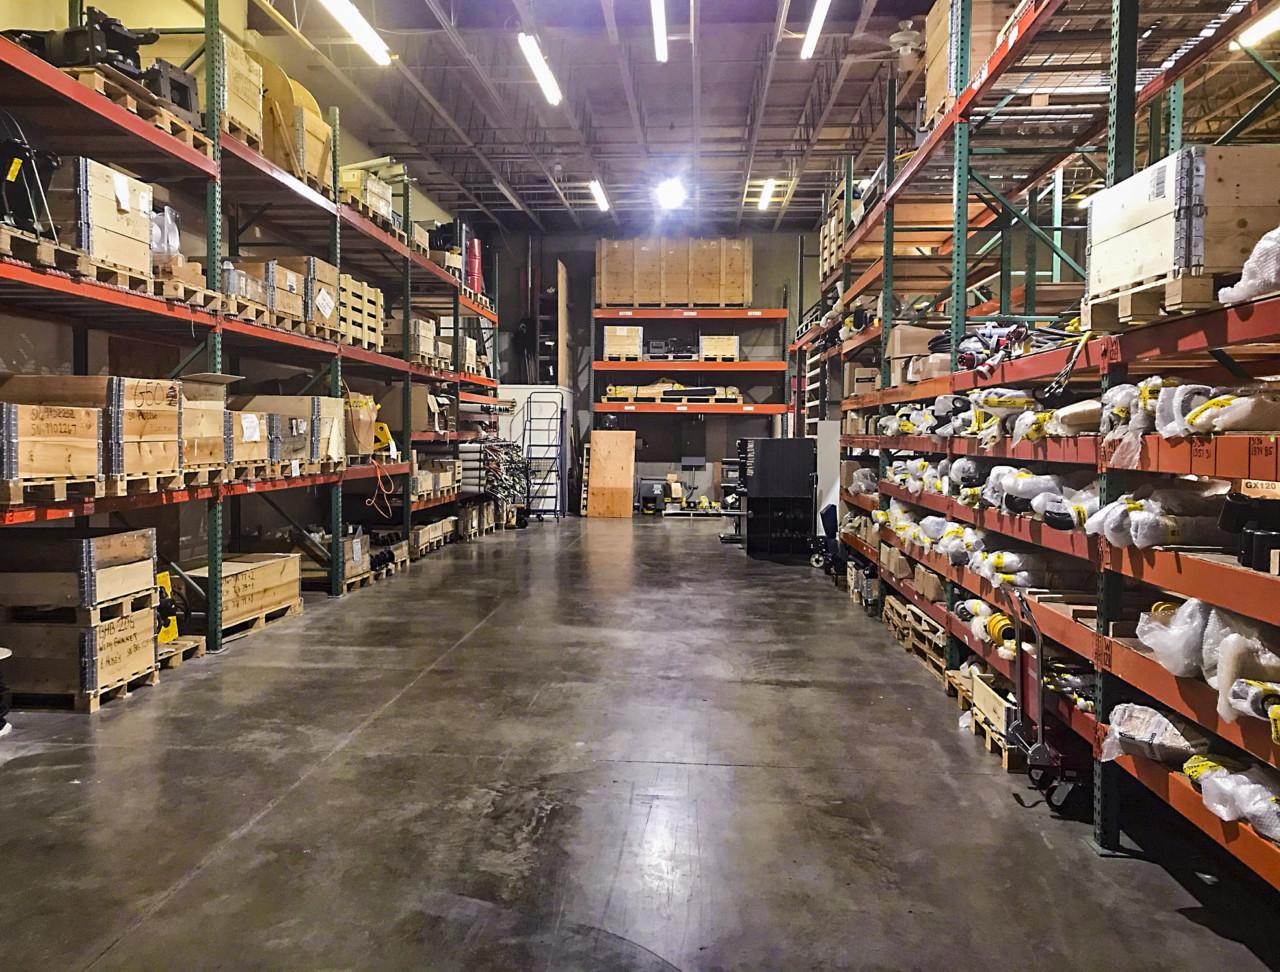 Brokk Upgrades Parts Warehouse to Ensure Fast Service